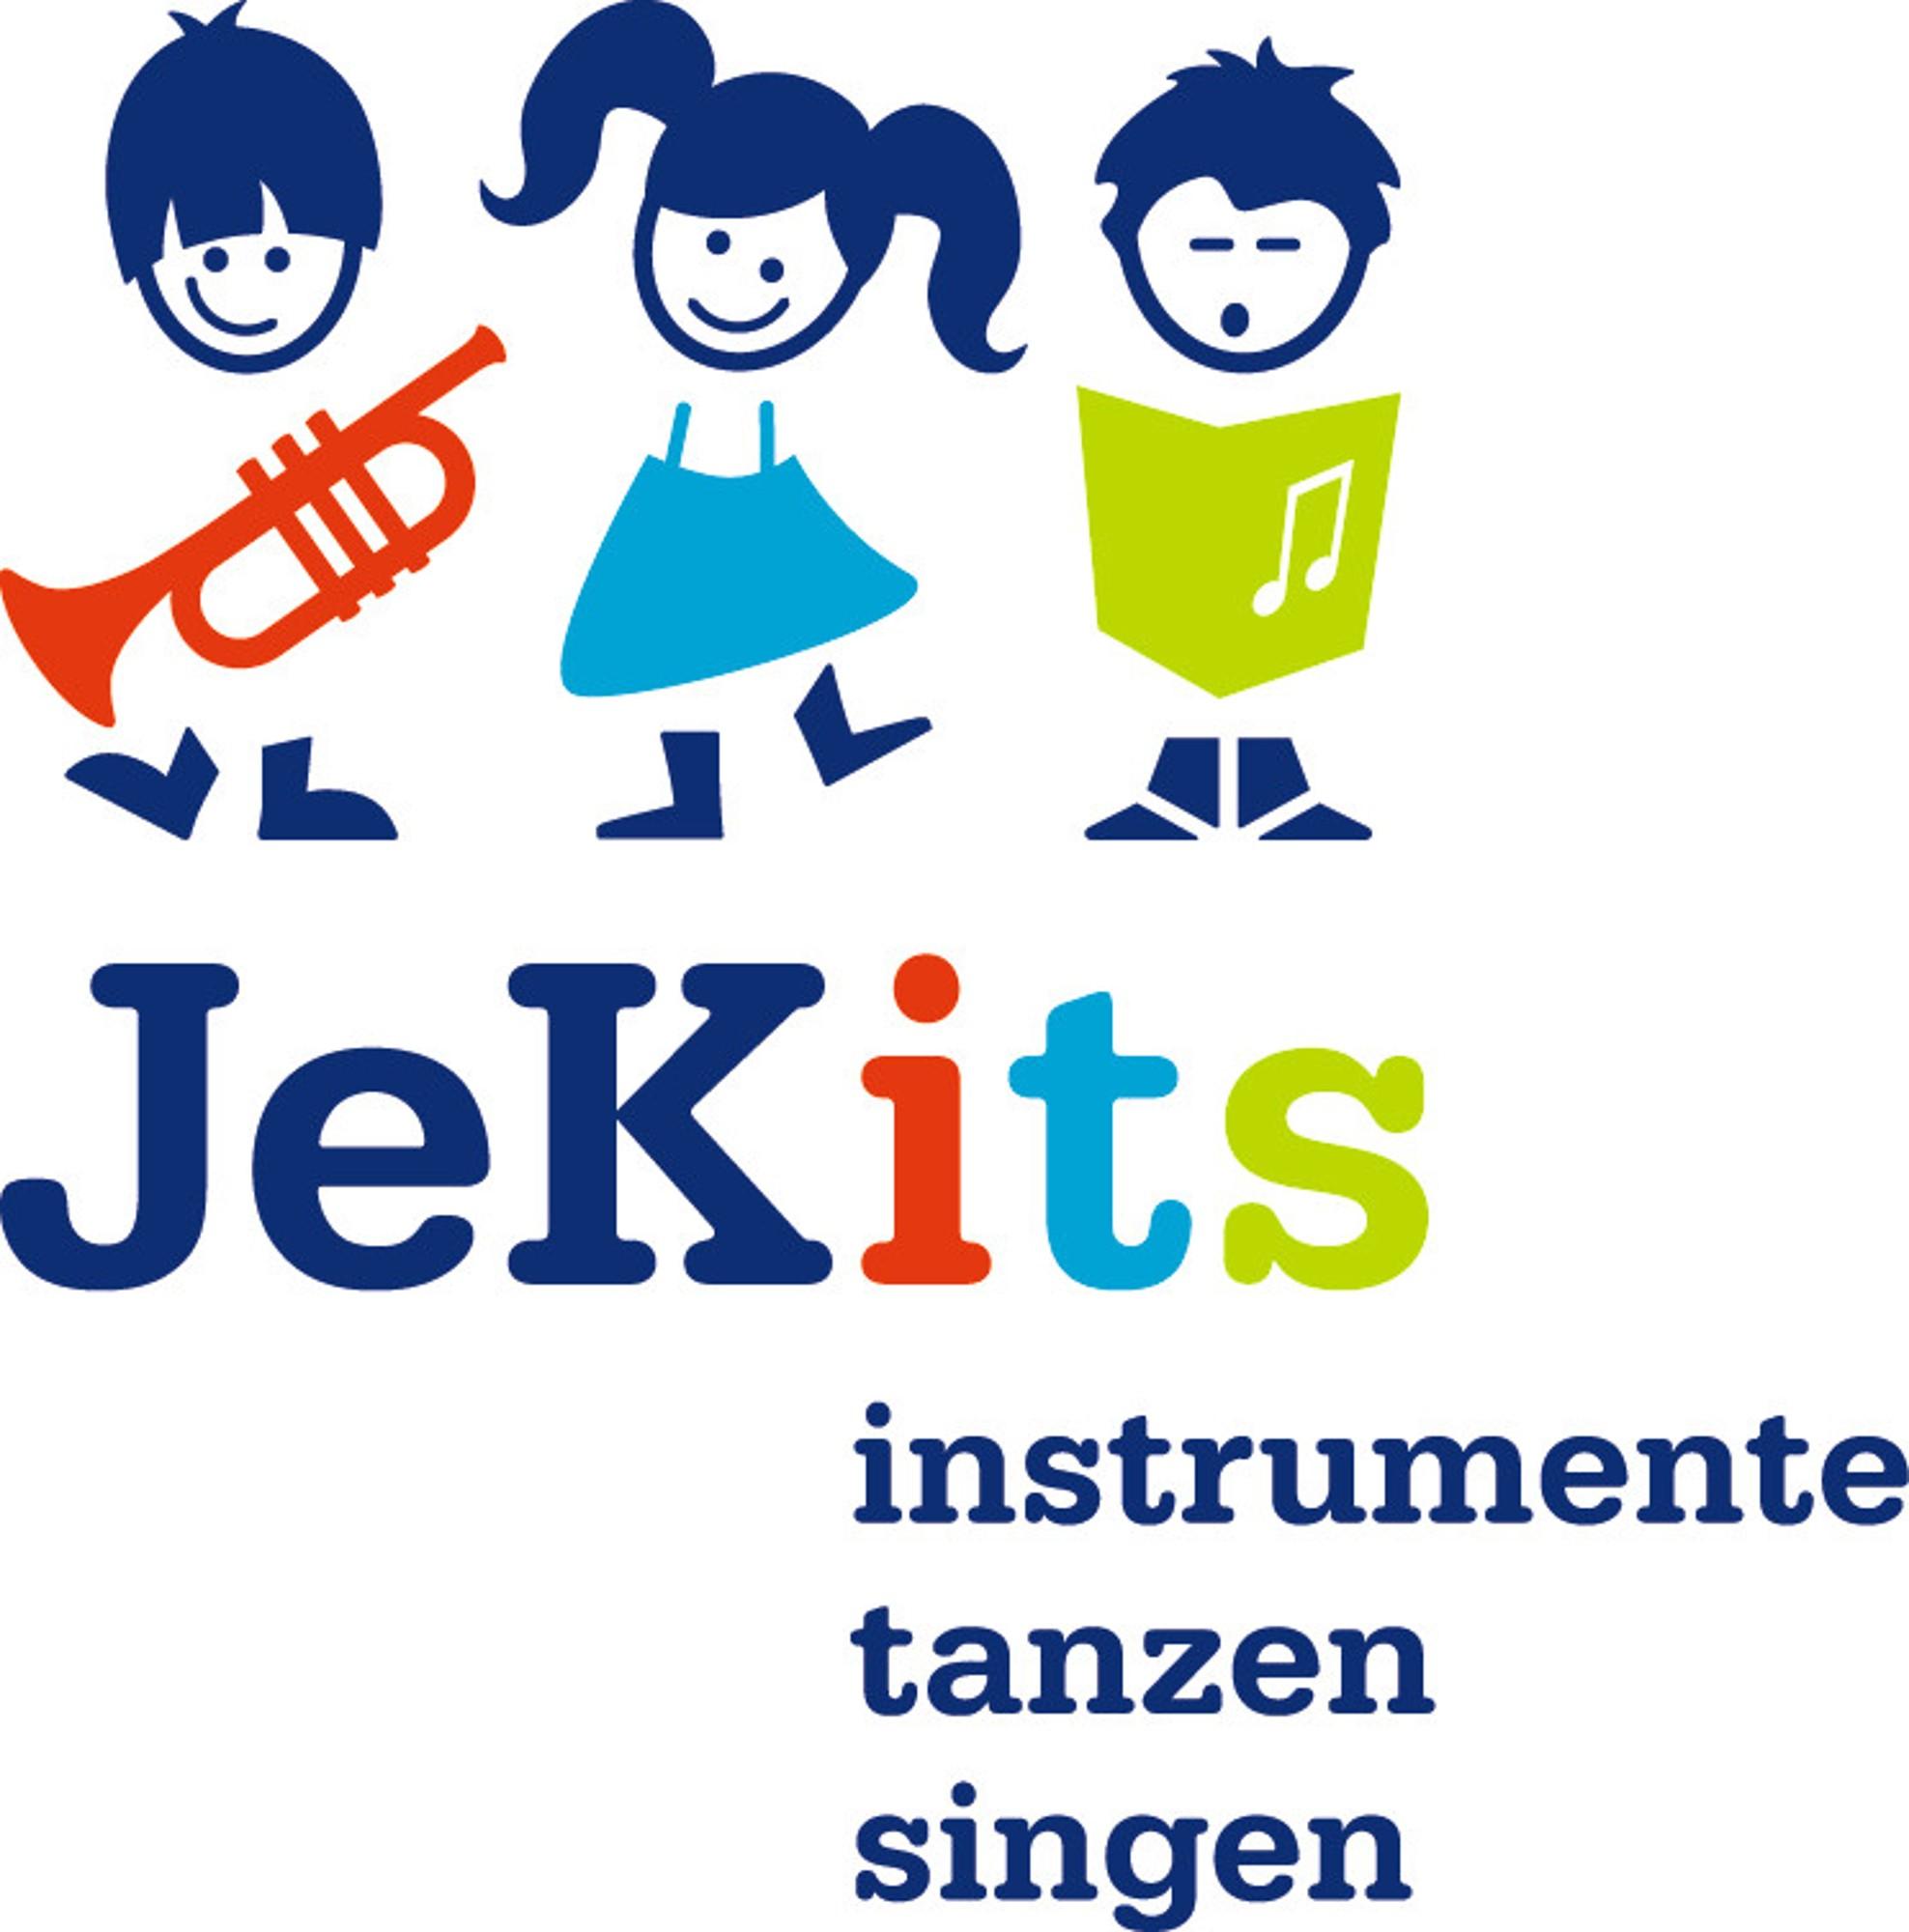 Jedem Kind Instrumente, Tanzen, Singen (JeKits) - Stadt Hagen